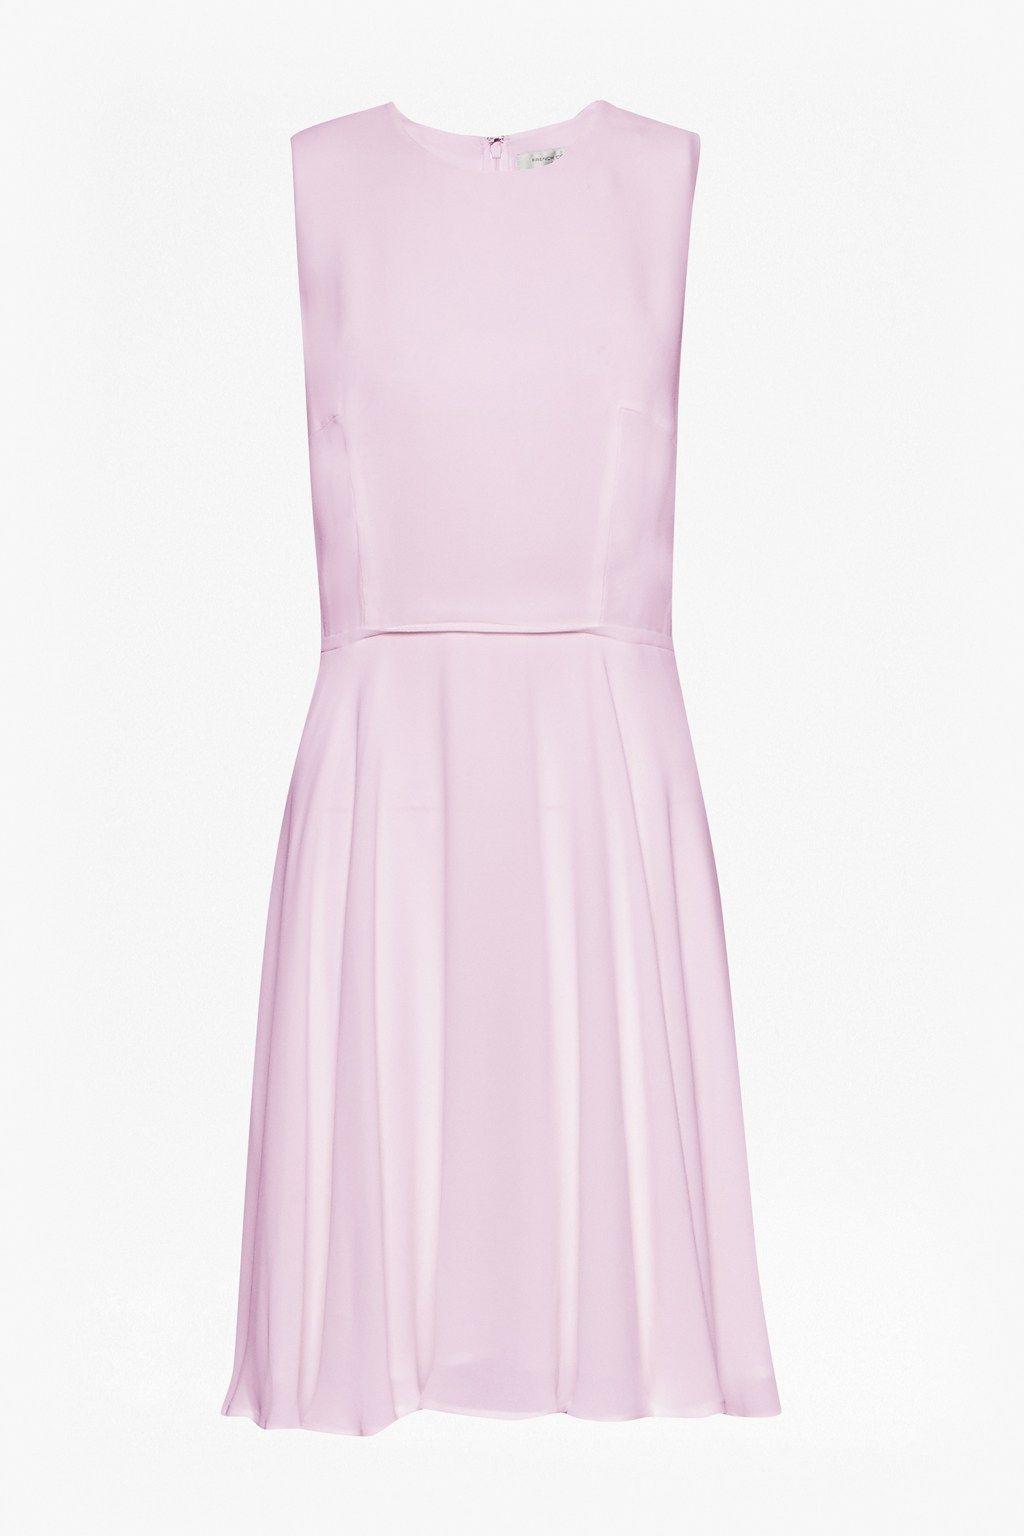 Ana Crepe Flare Dress - Dresses - French Connection | Boho | Pinterest